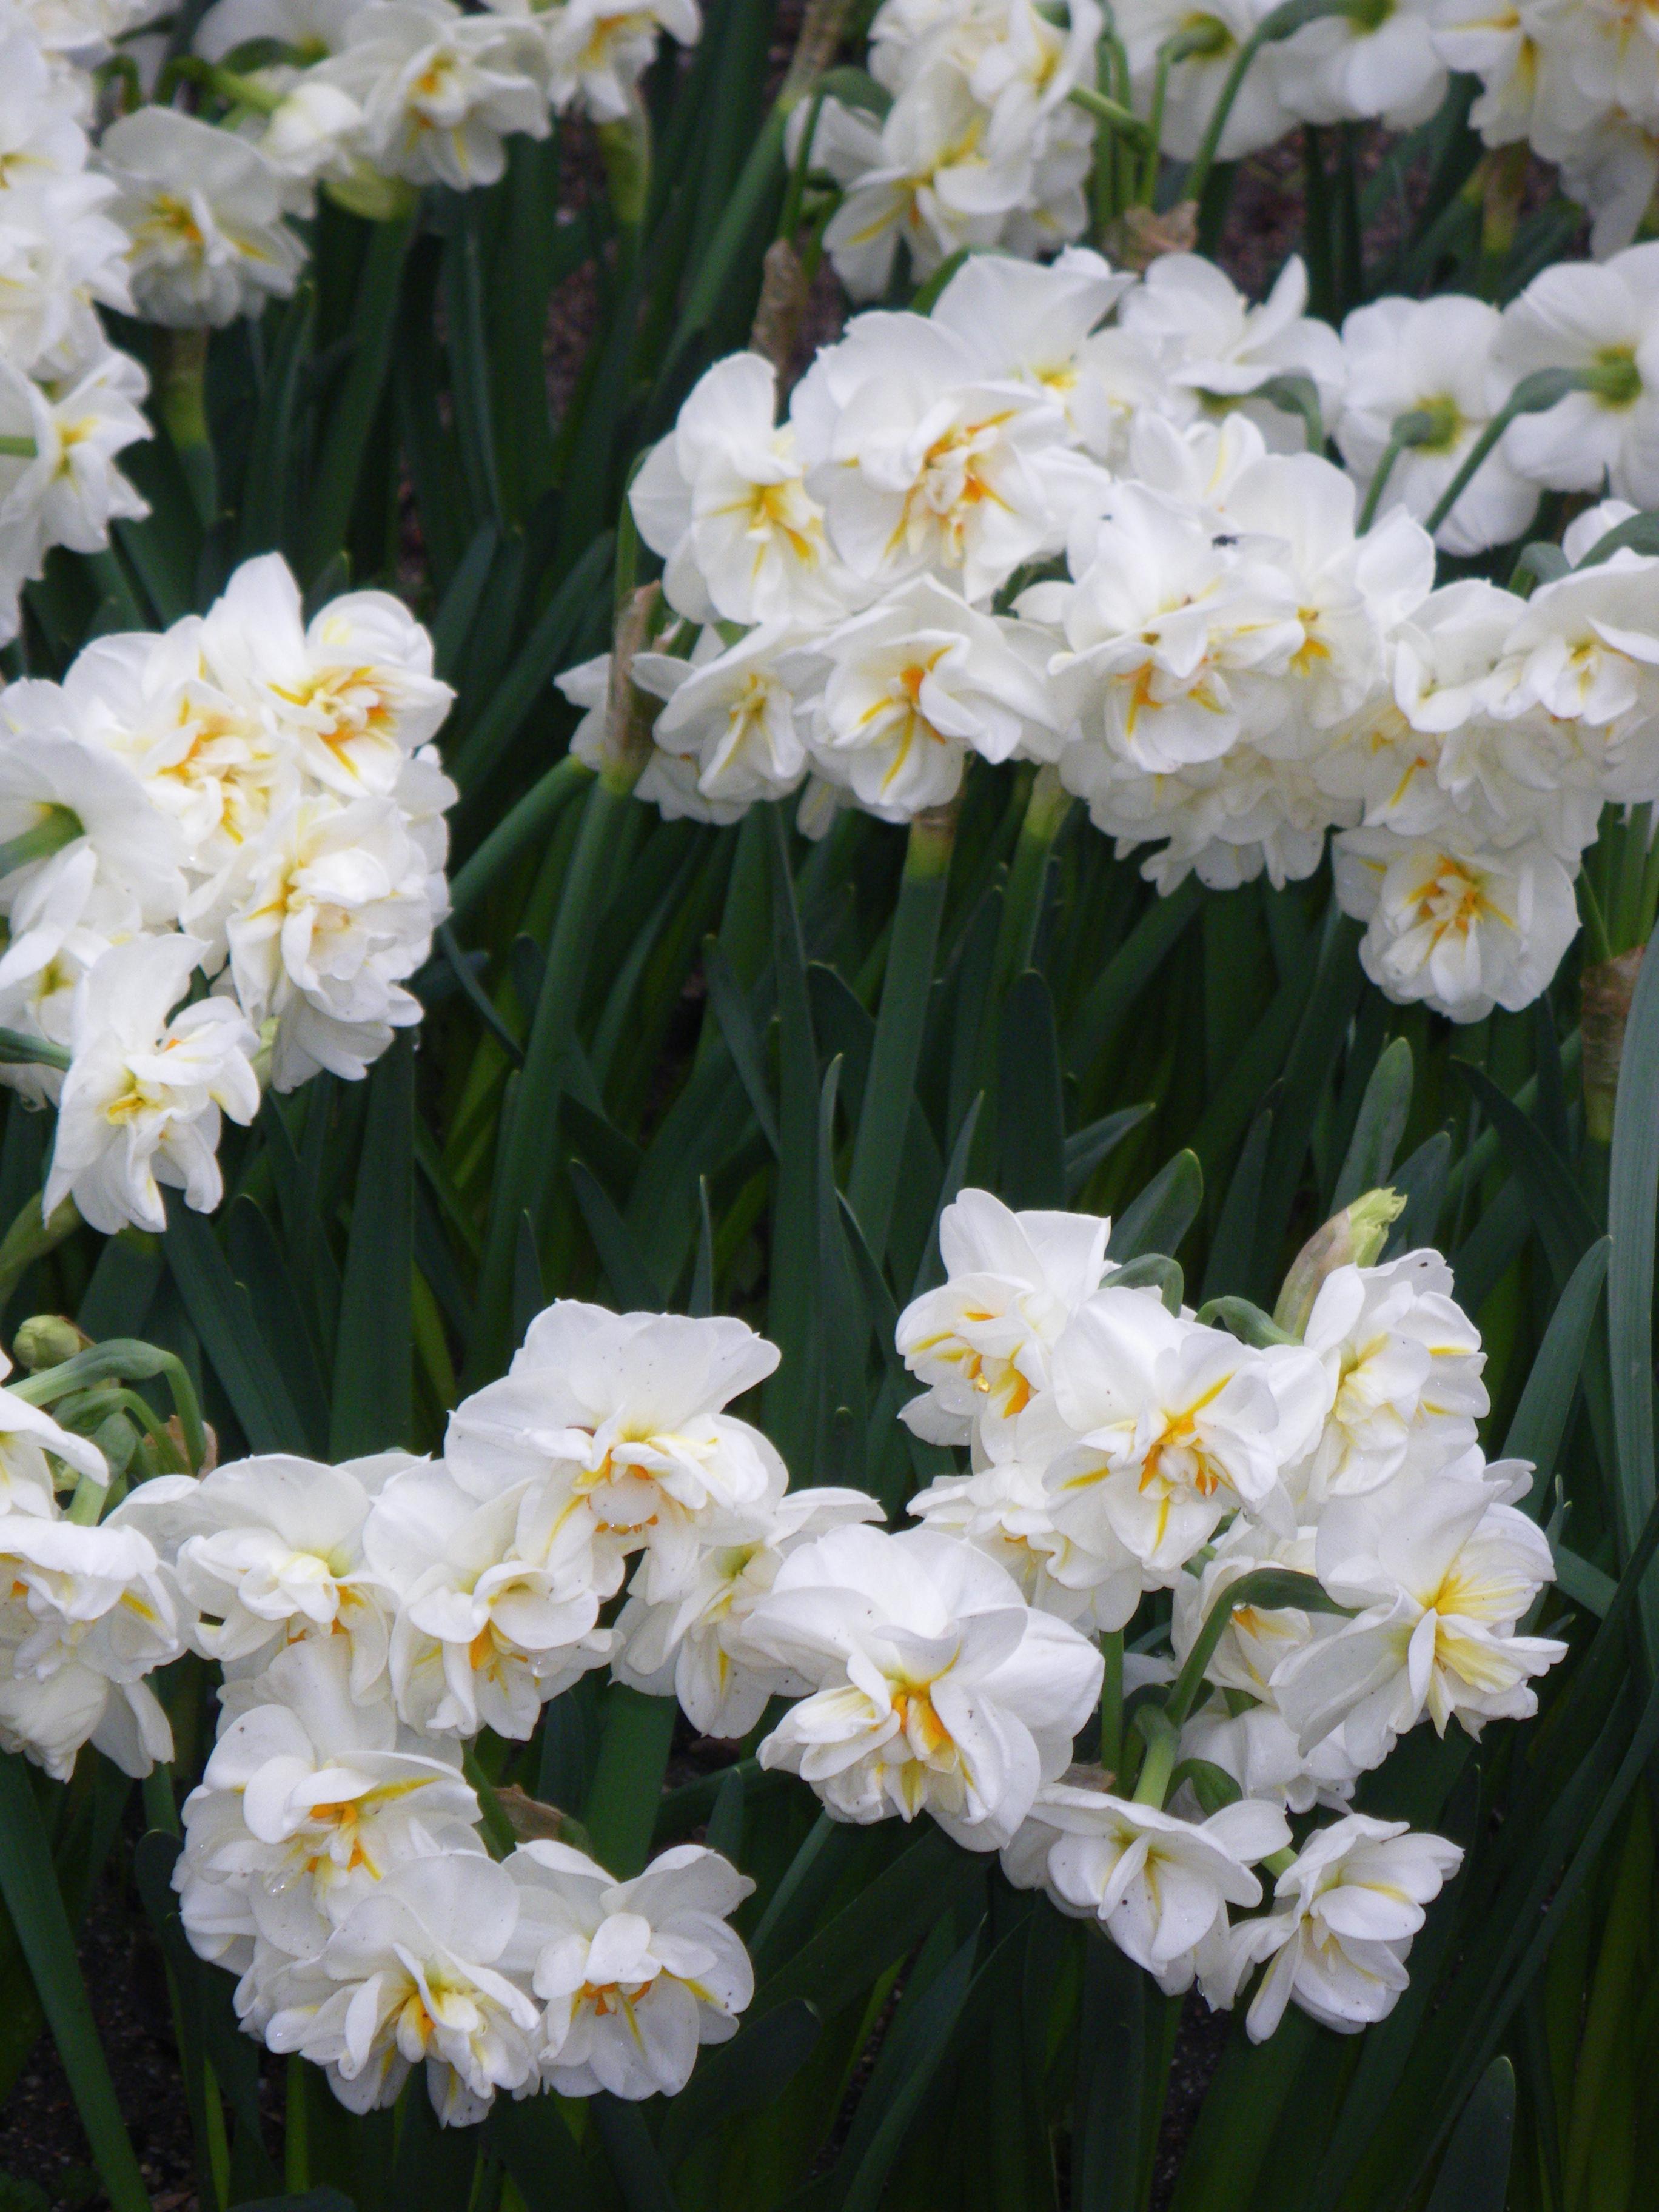 Нарцисс эрличир: описание и характеристики сорта, посадка и уход, зона зимостойкости